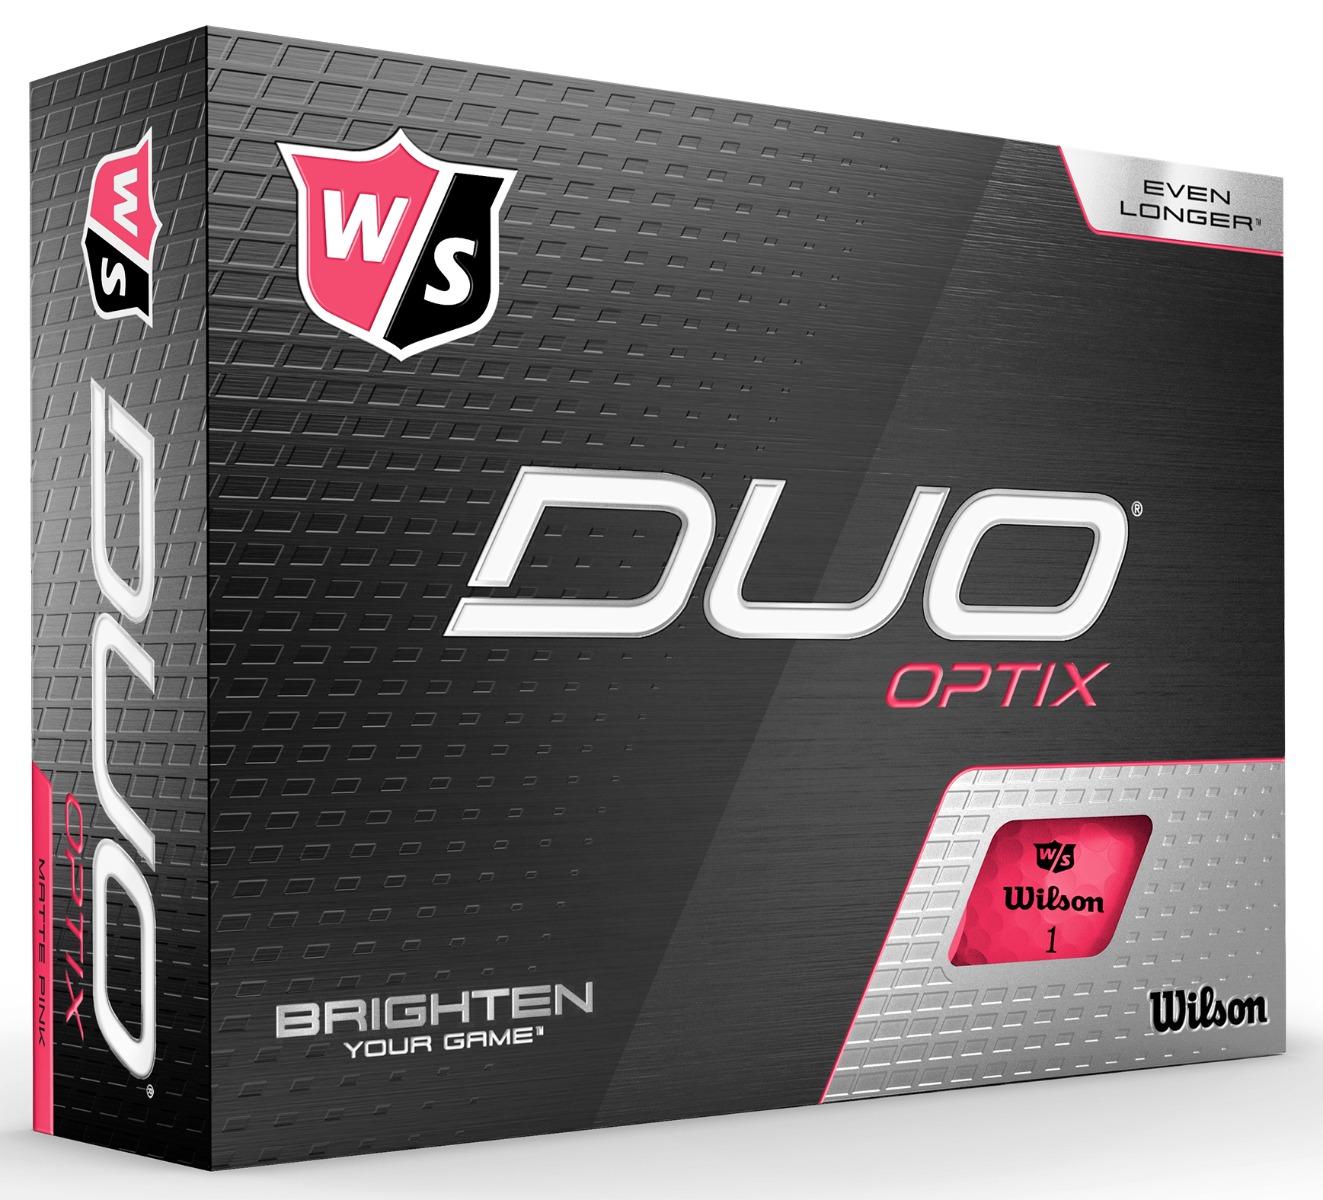 https://www.best4sportsballs.com/pub/media/catalog/product/d/u/duo_optix_pink_box.jpg